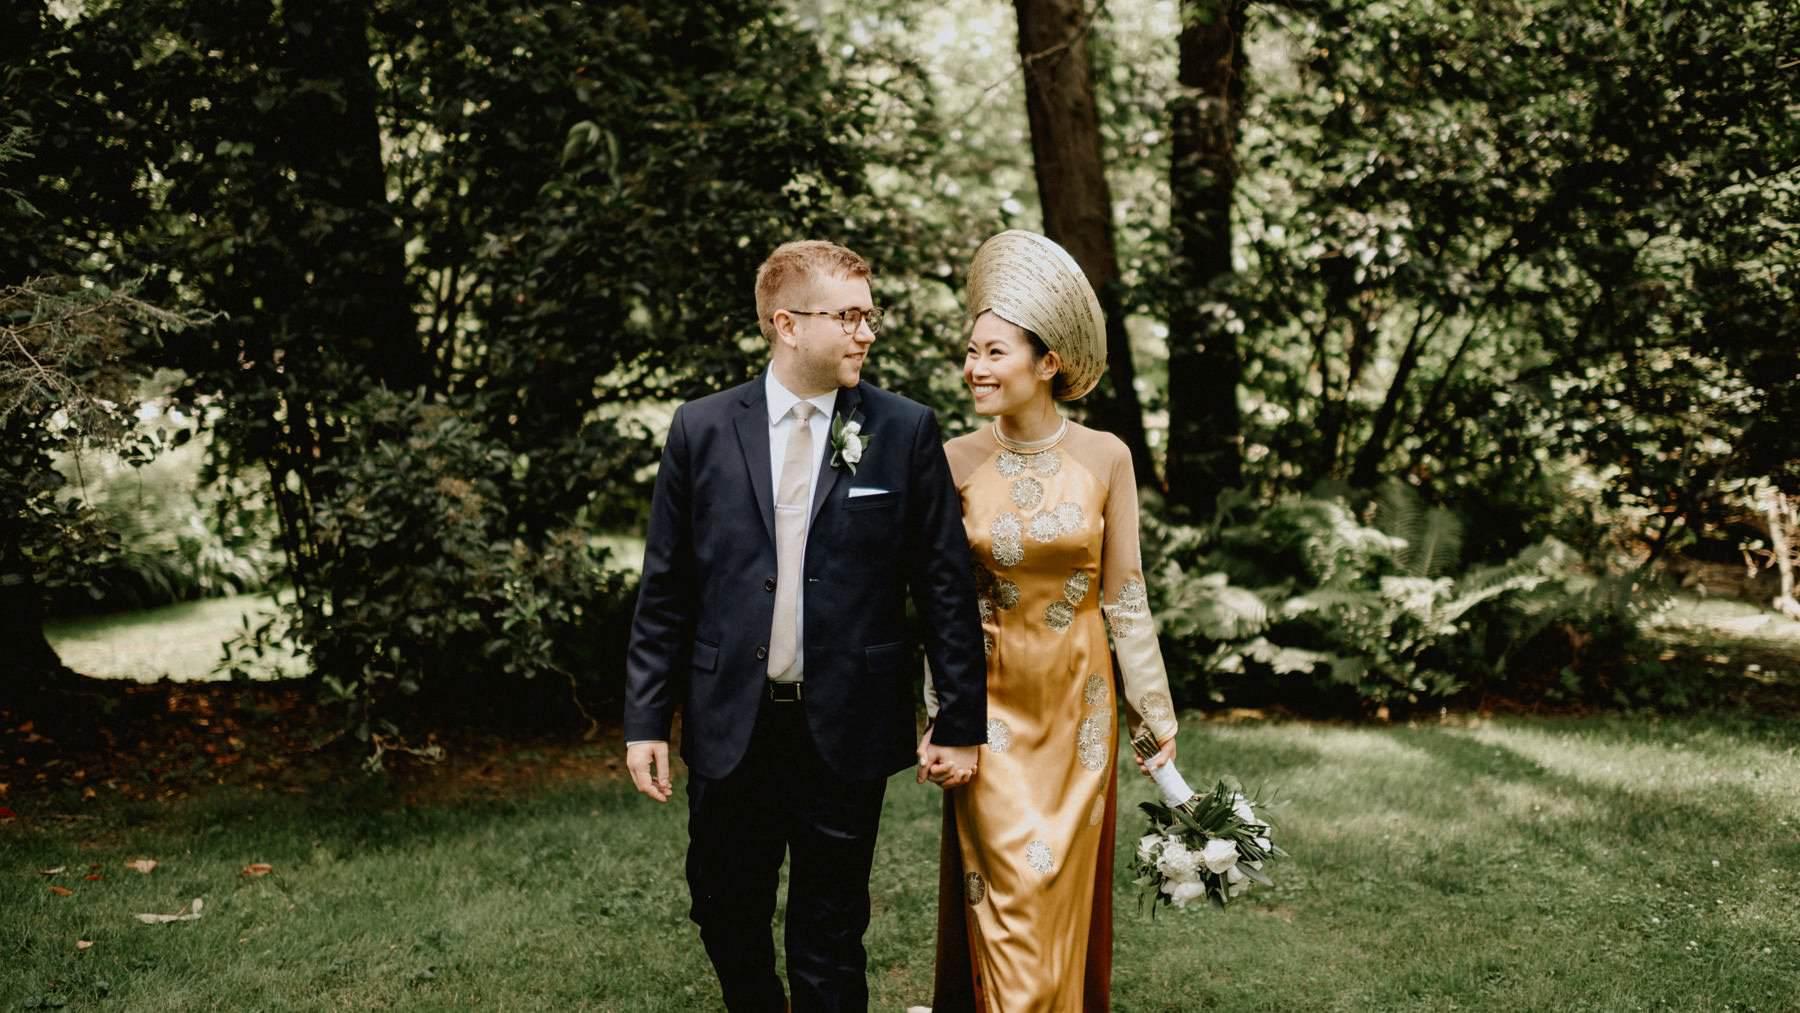 Appleford-estate-wedding-36.jpg